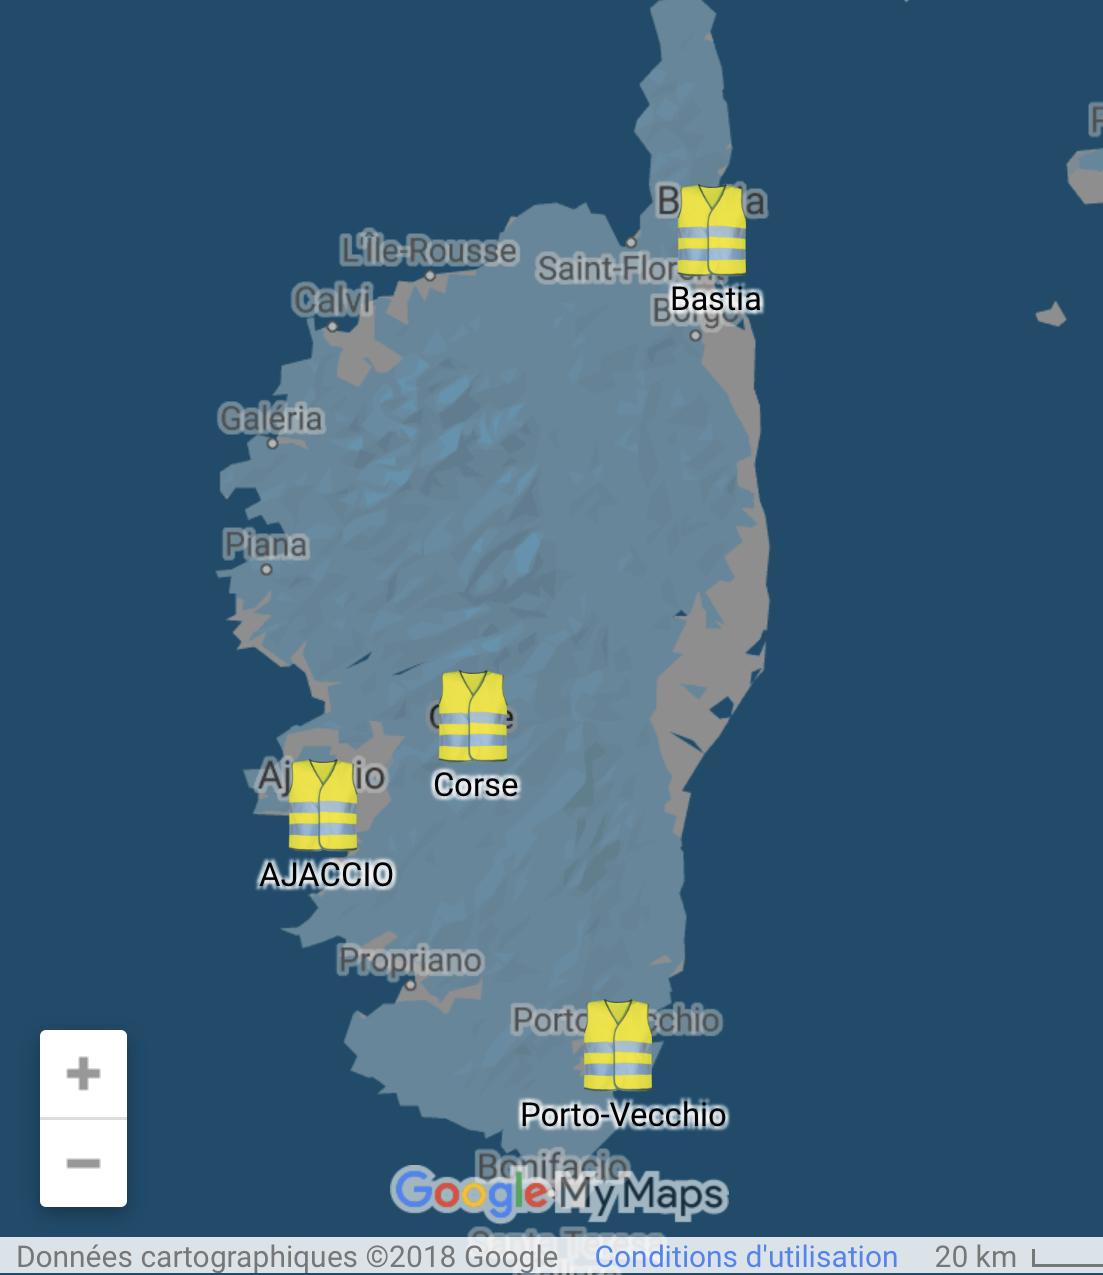 17 novembre : où seront les gilets jaunes en Corse ? La carte en direct